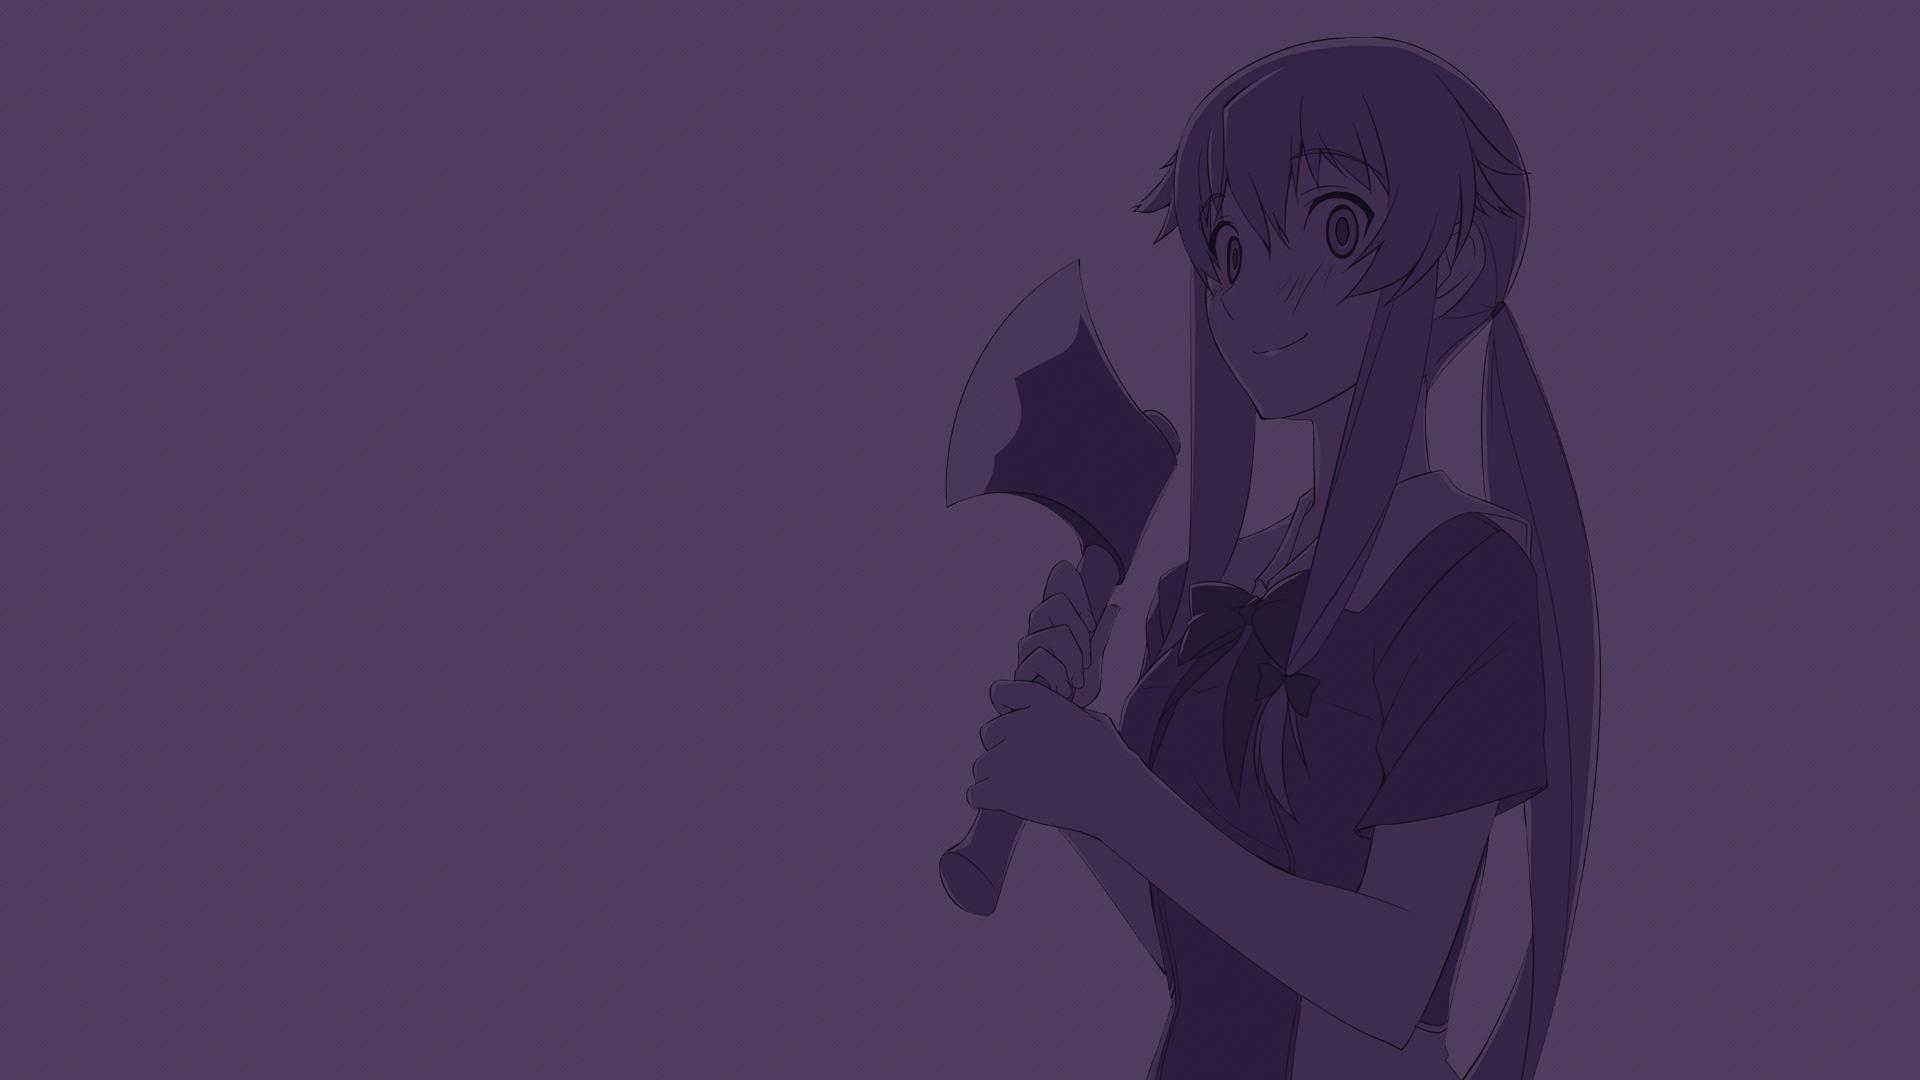 Drawing Illustration Monochrome Anime Girls Mirai Nikki Gasai Yuno Yandere Hand Sketch Screenshot Black And